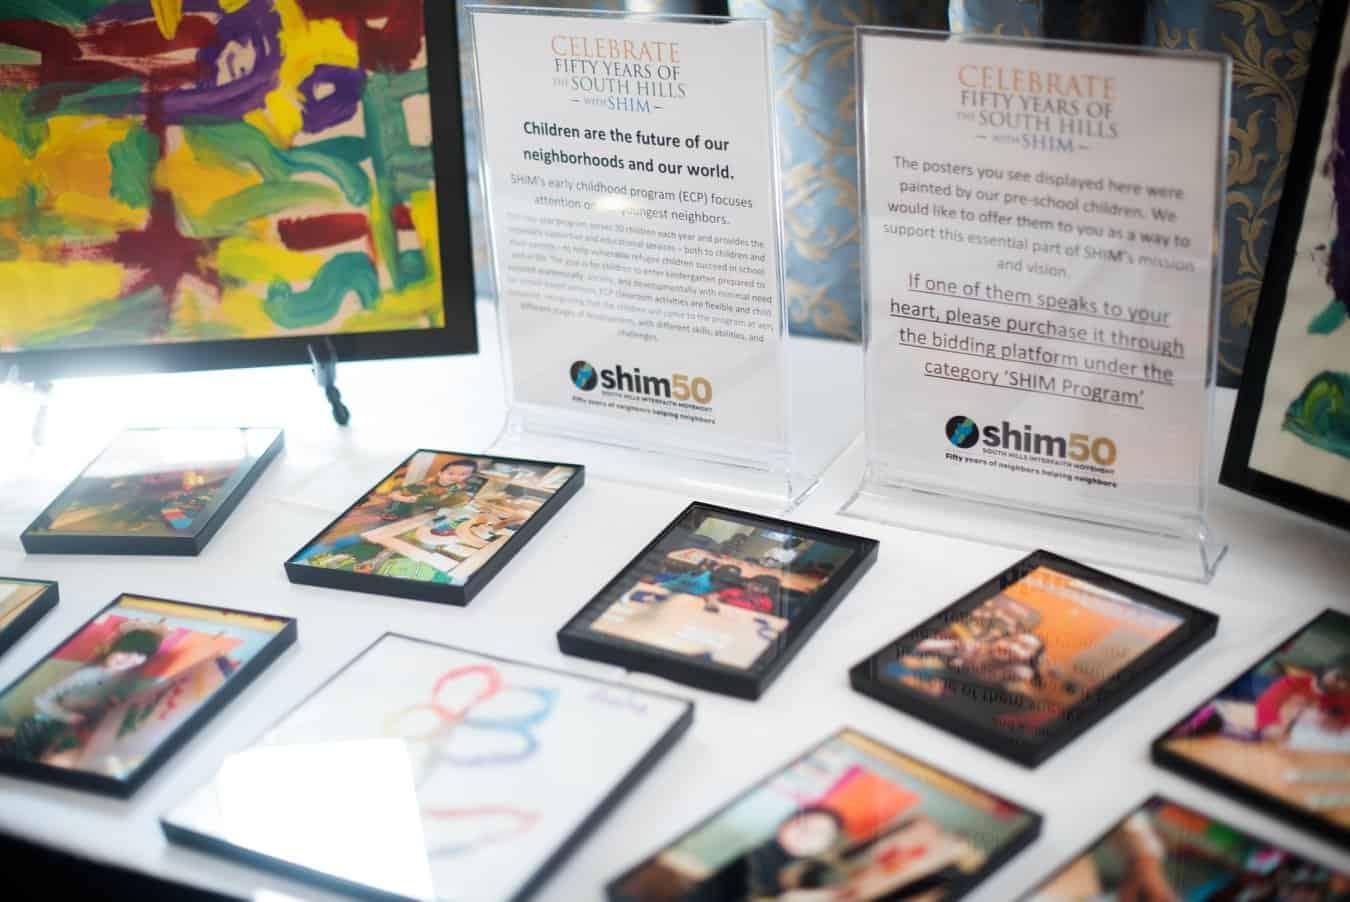 Celebrate SHIM 2018 auction items